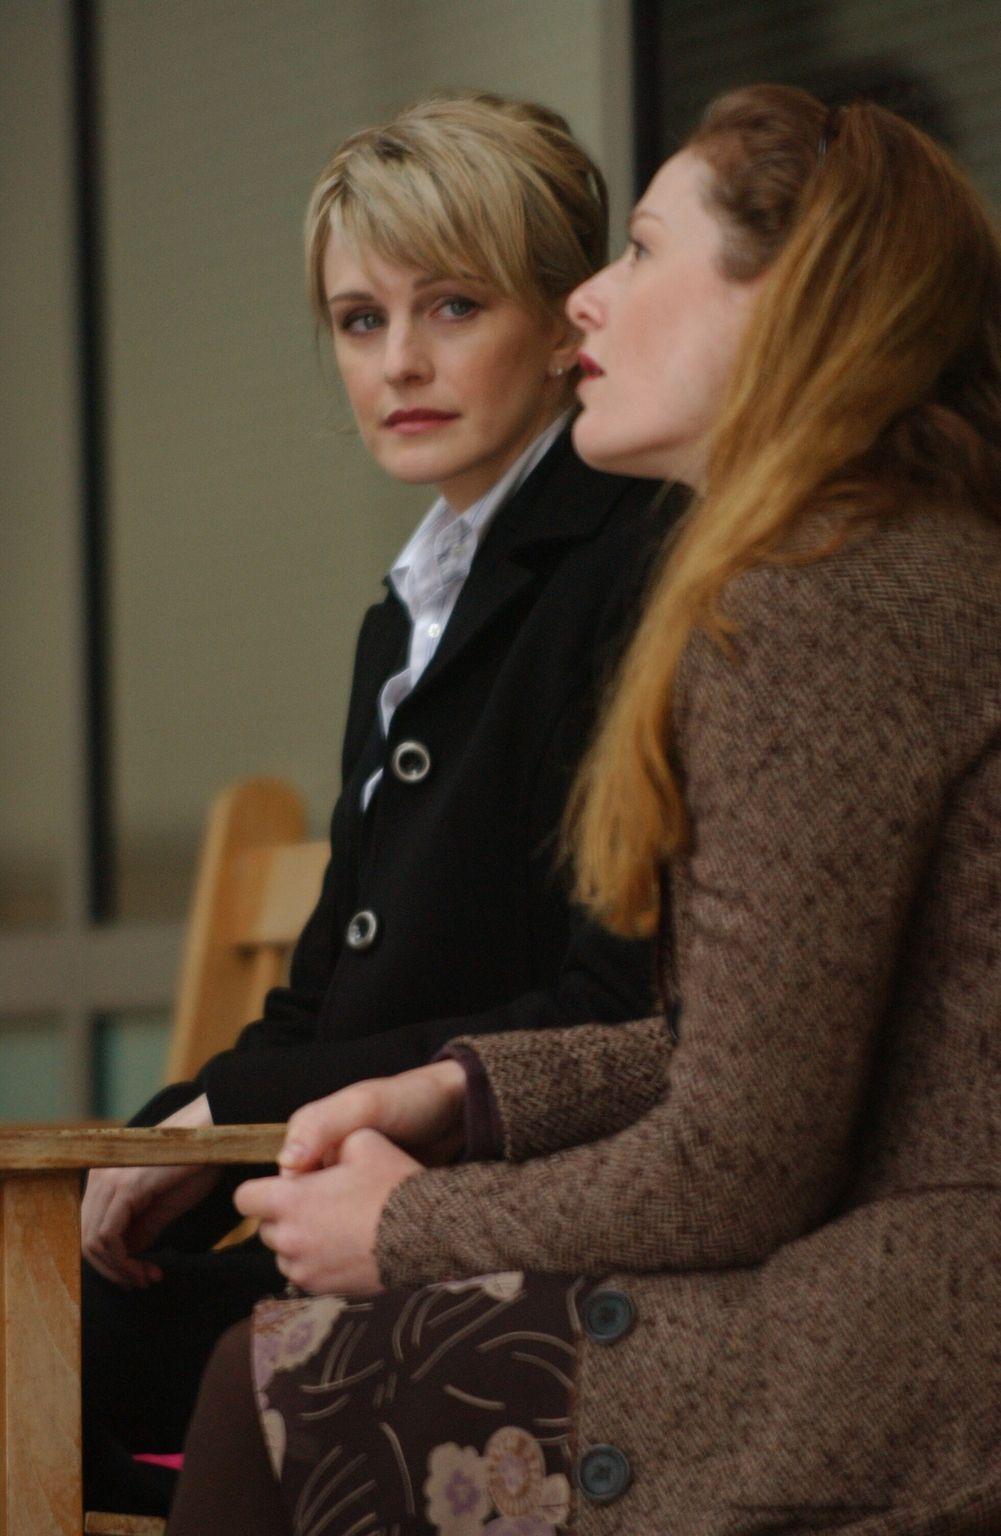 Jaime King,Caroline Carver (actress) Sex archive Tina Fey,Iliza Shlesinger